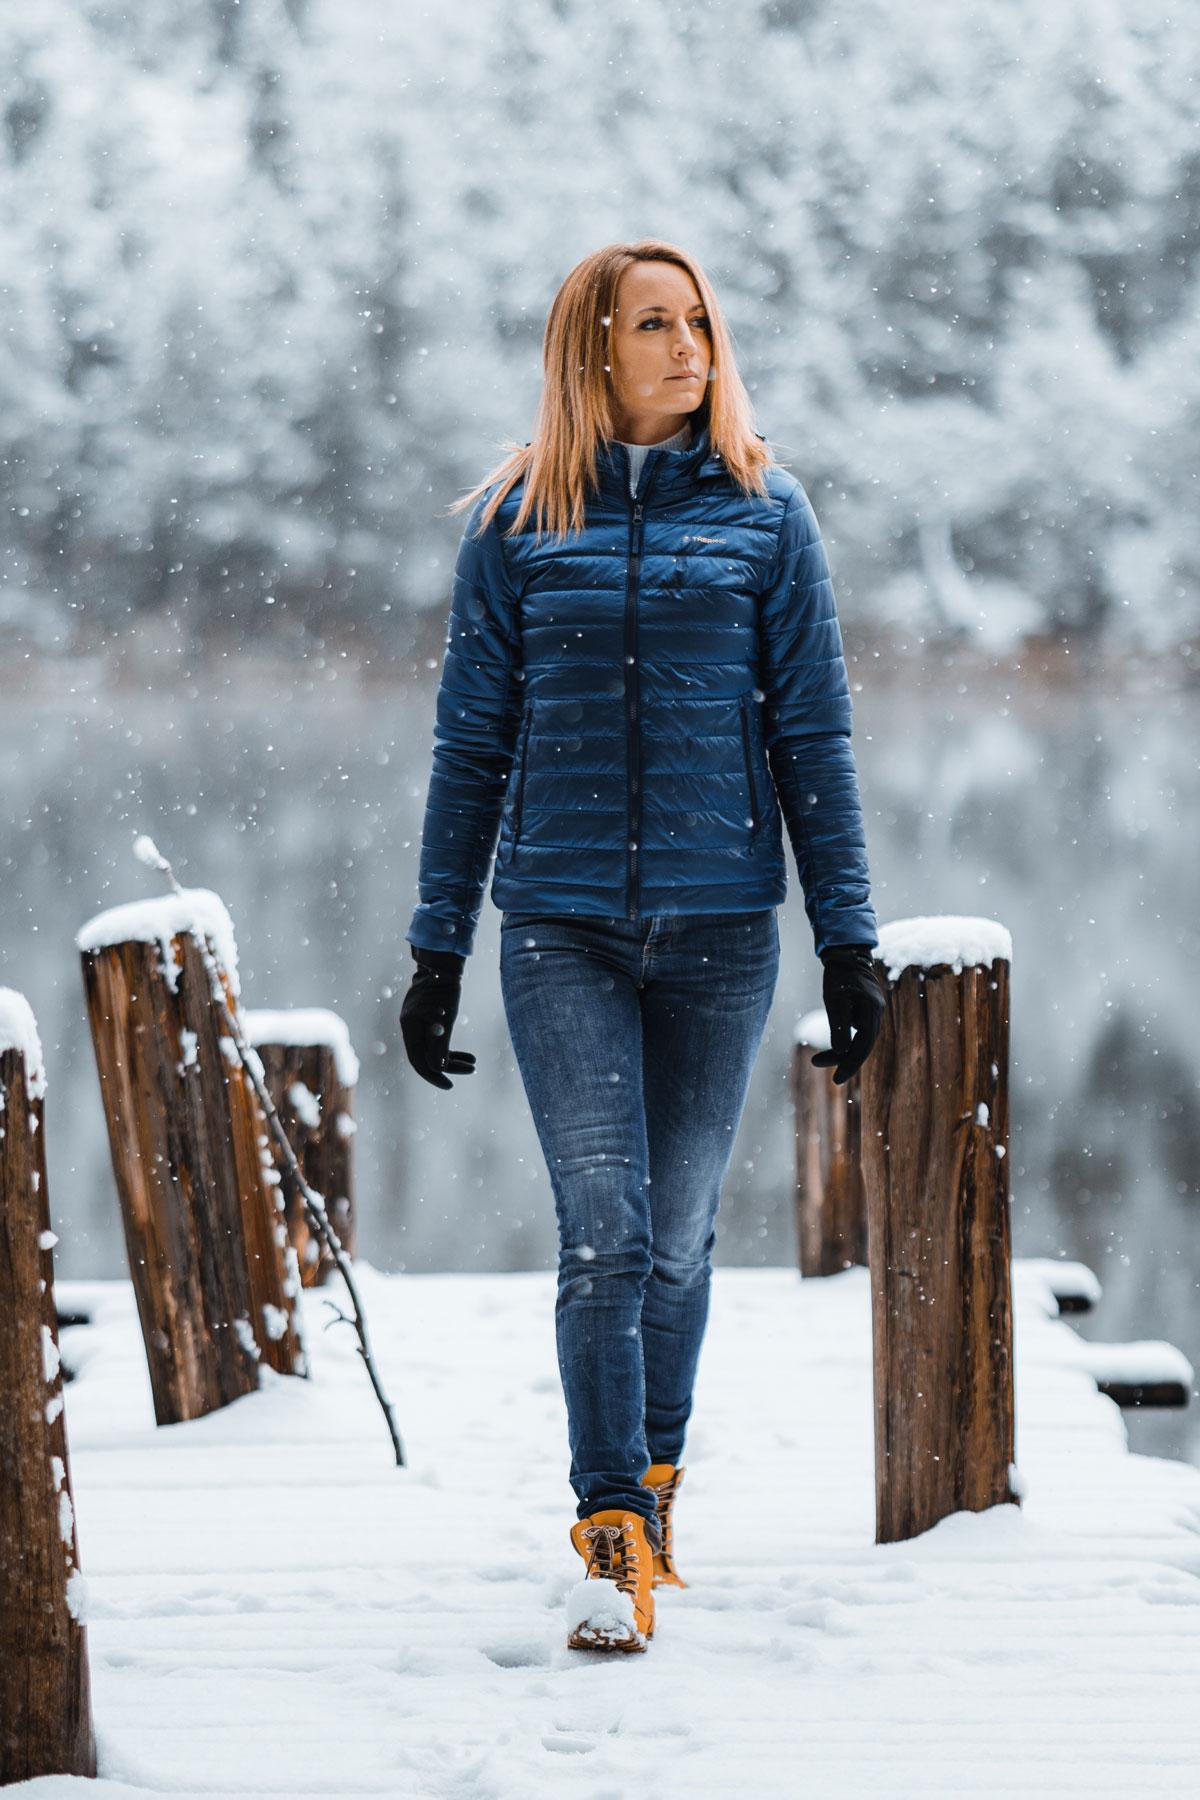 Veste chauffante femme mode - Therm-ic - Chauffe